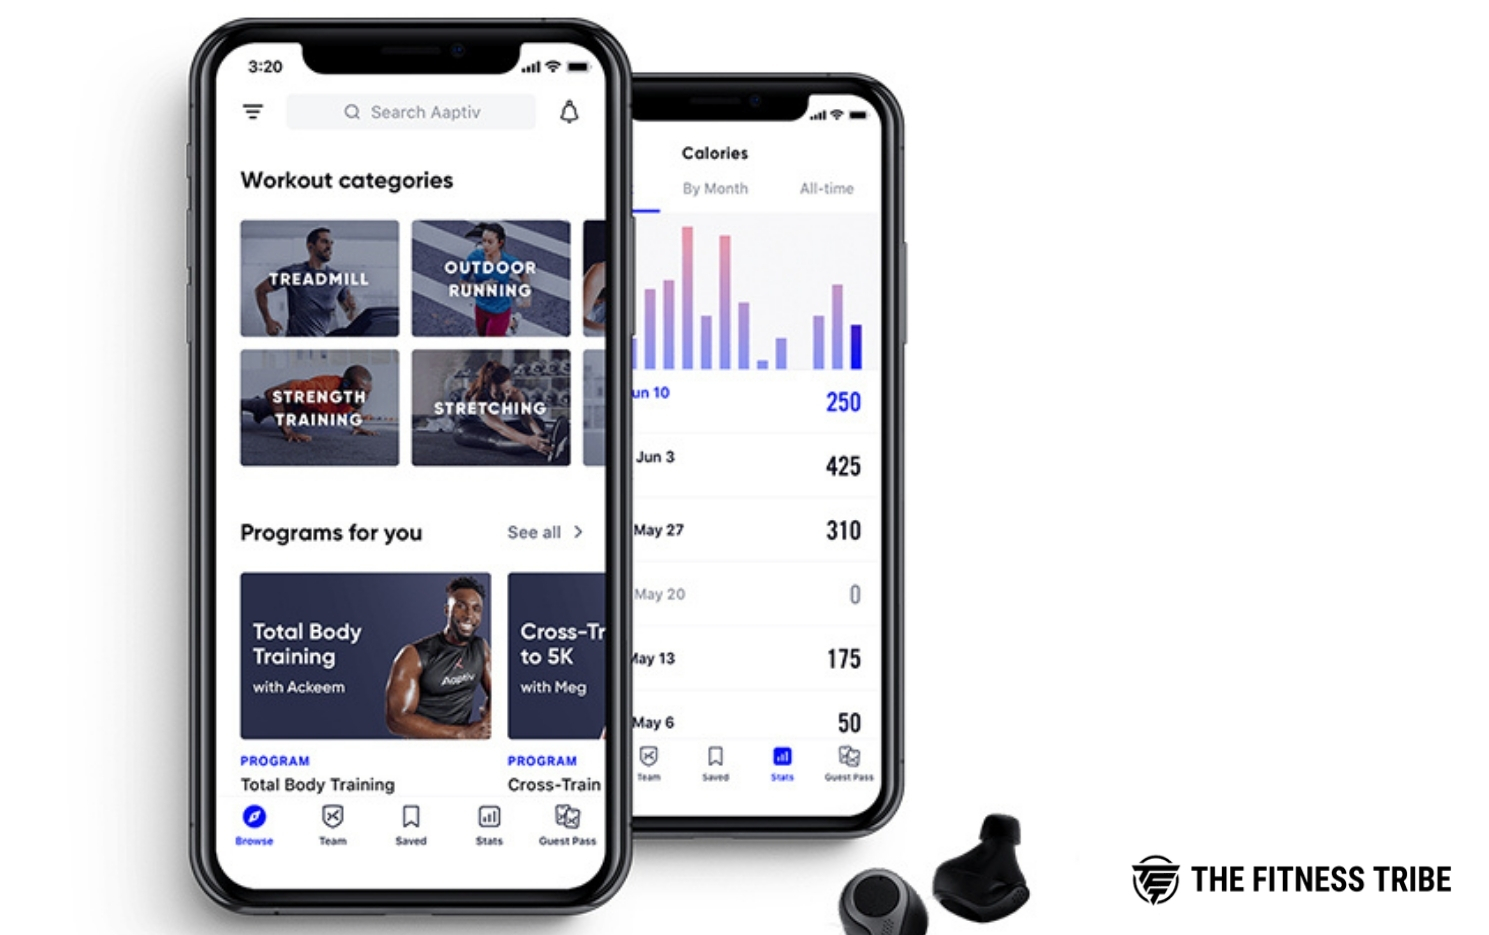 Aaptiv - Workout App: Fitness Classes & Training Programs